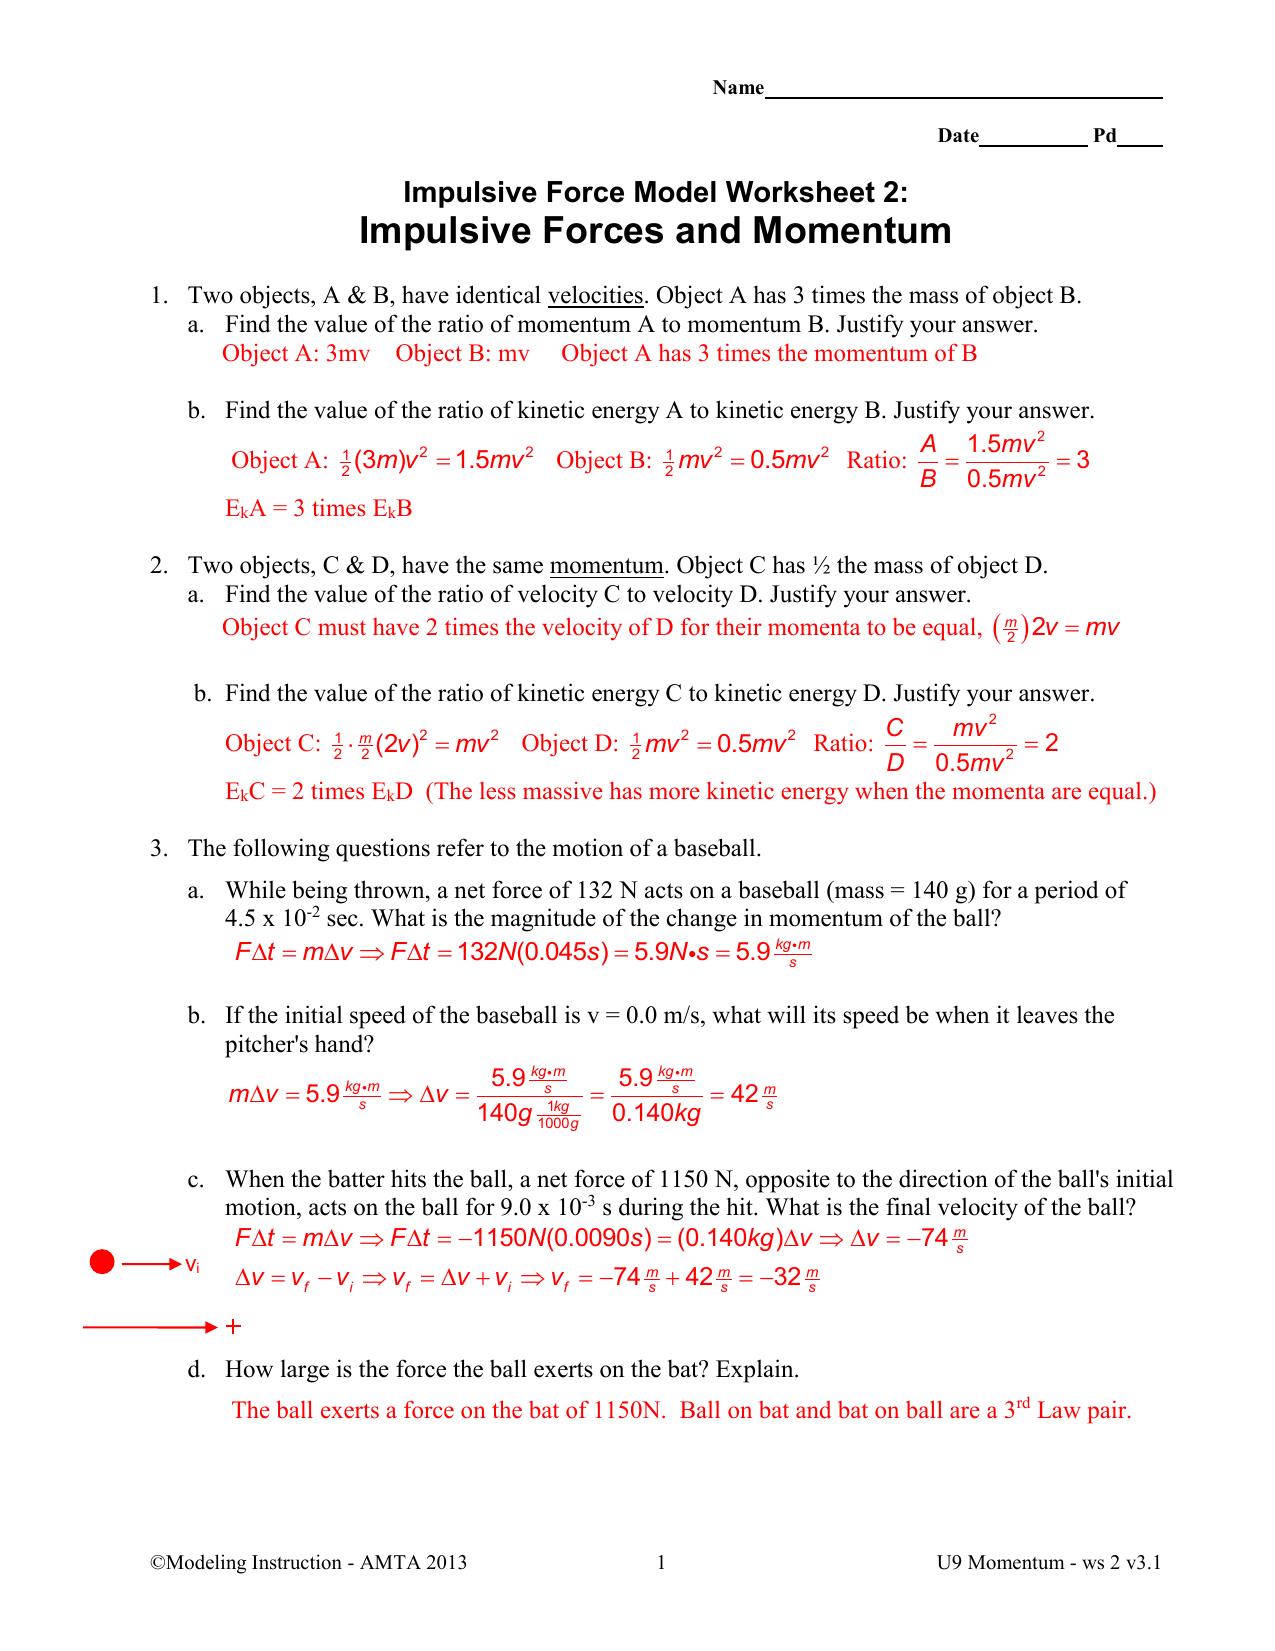 Worksheets Momentum Worksheet impulsive forces and momentum